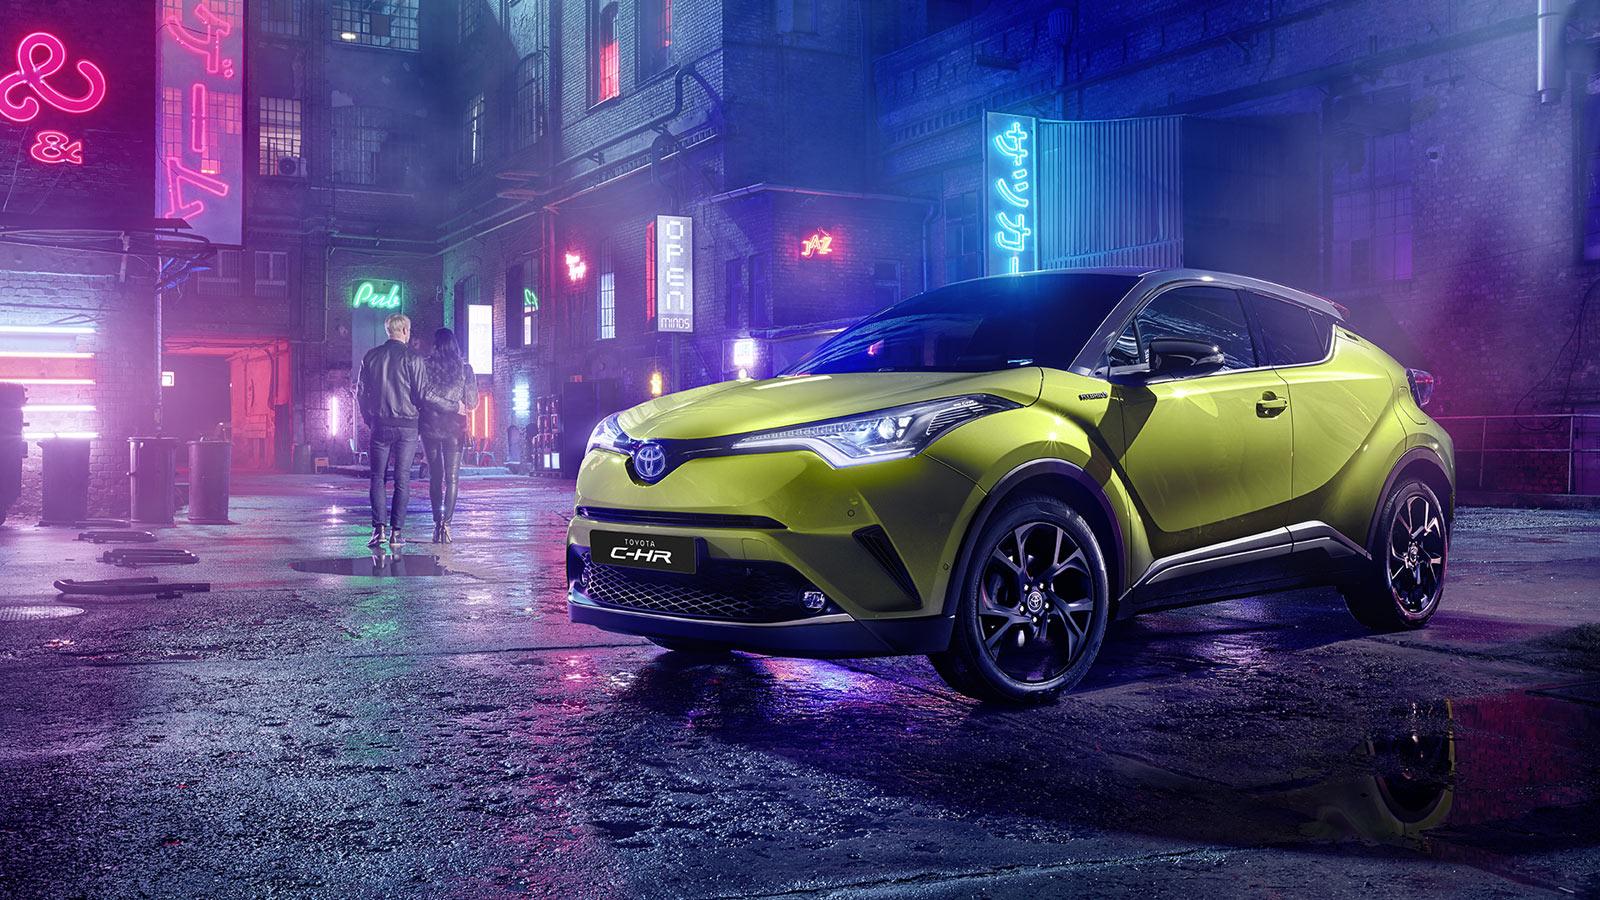 Arriva la nuova Toyota C-HR Neon Lime alimentata da JBL thumbnail